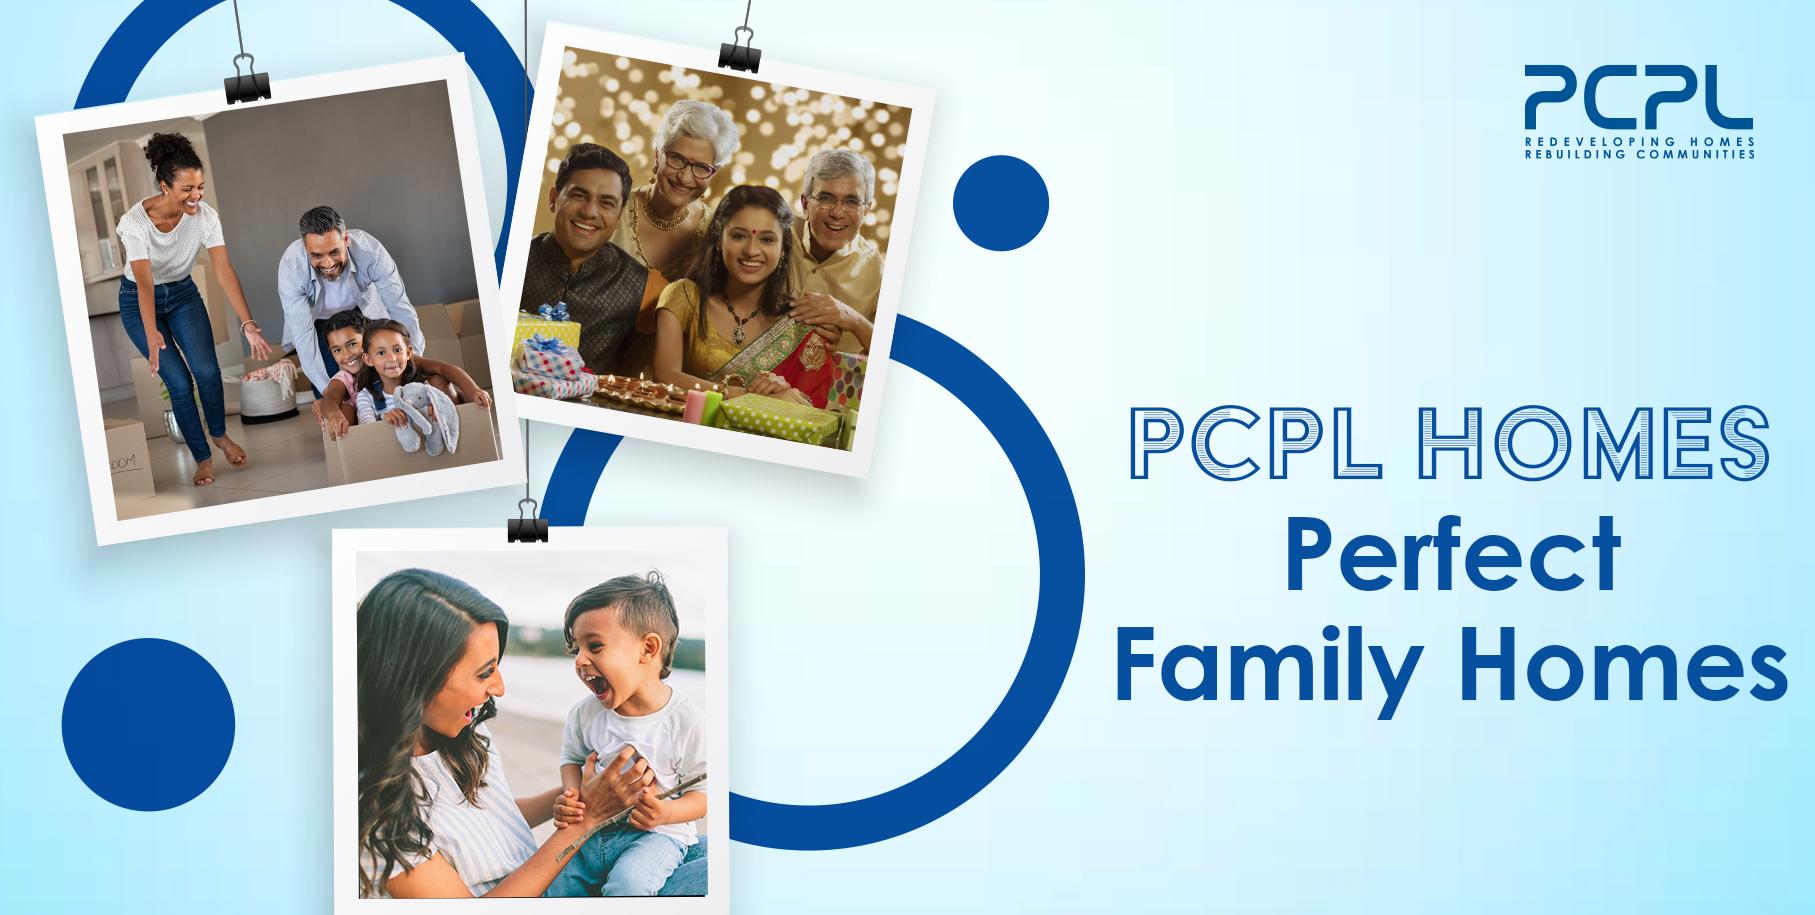 PCPL Homes – Perfect Family Homes